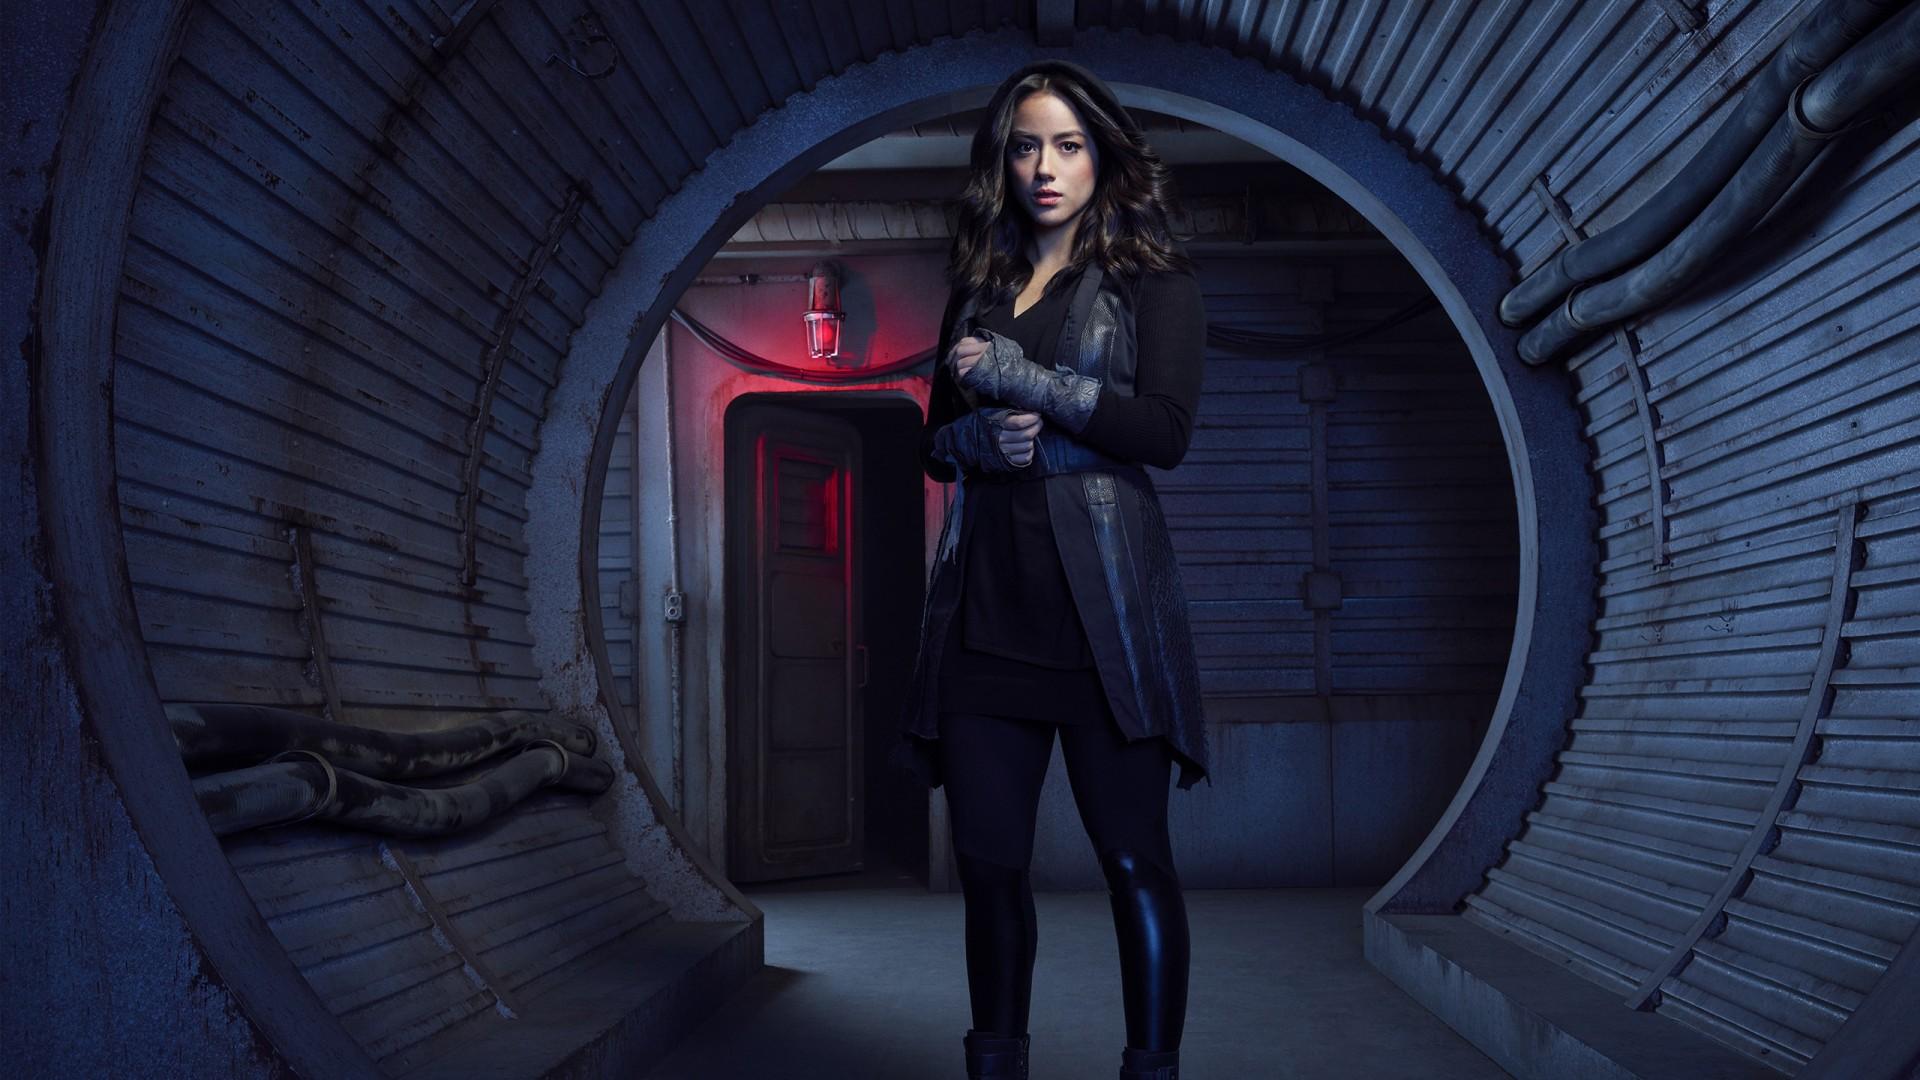 Voltron Wallpaper Iphone Chloe Bennet As Daisy Johnson Agents Of Shield Season 5